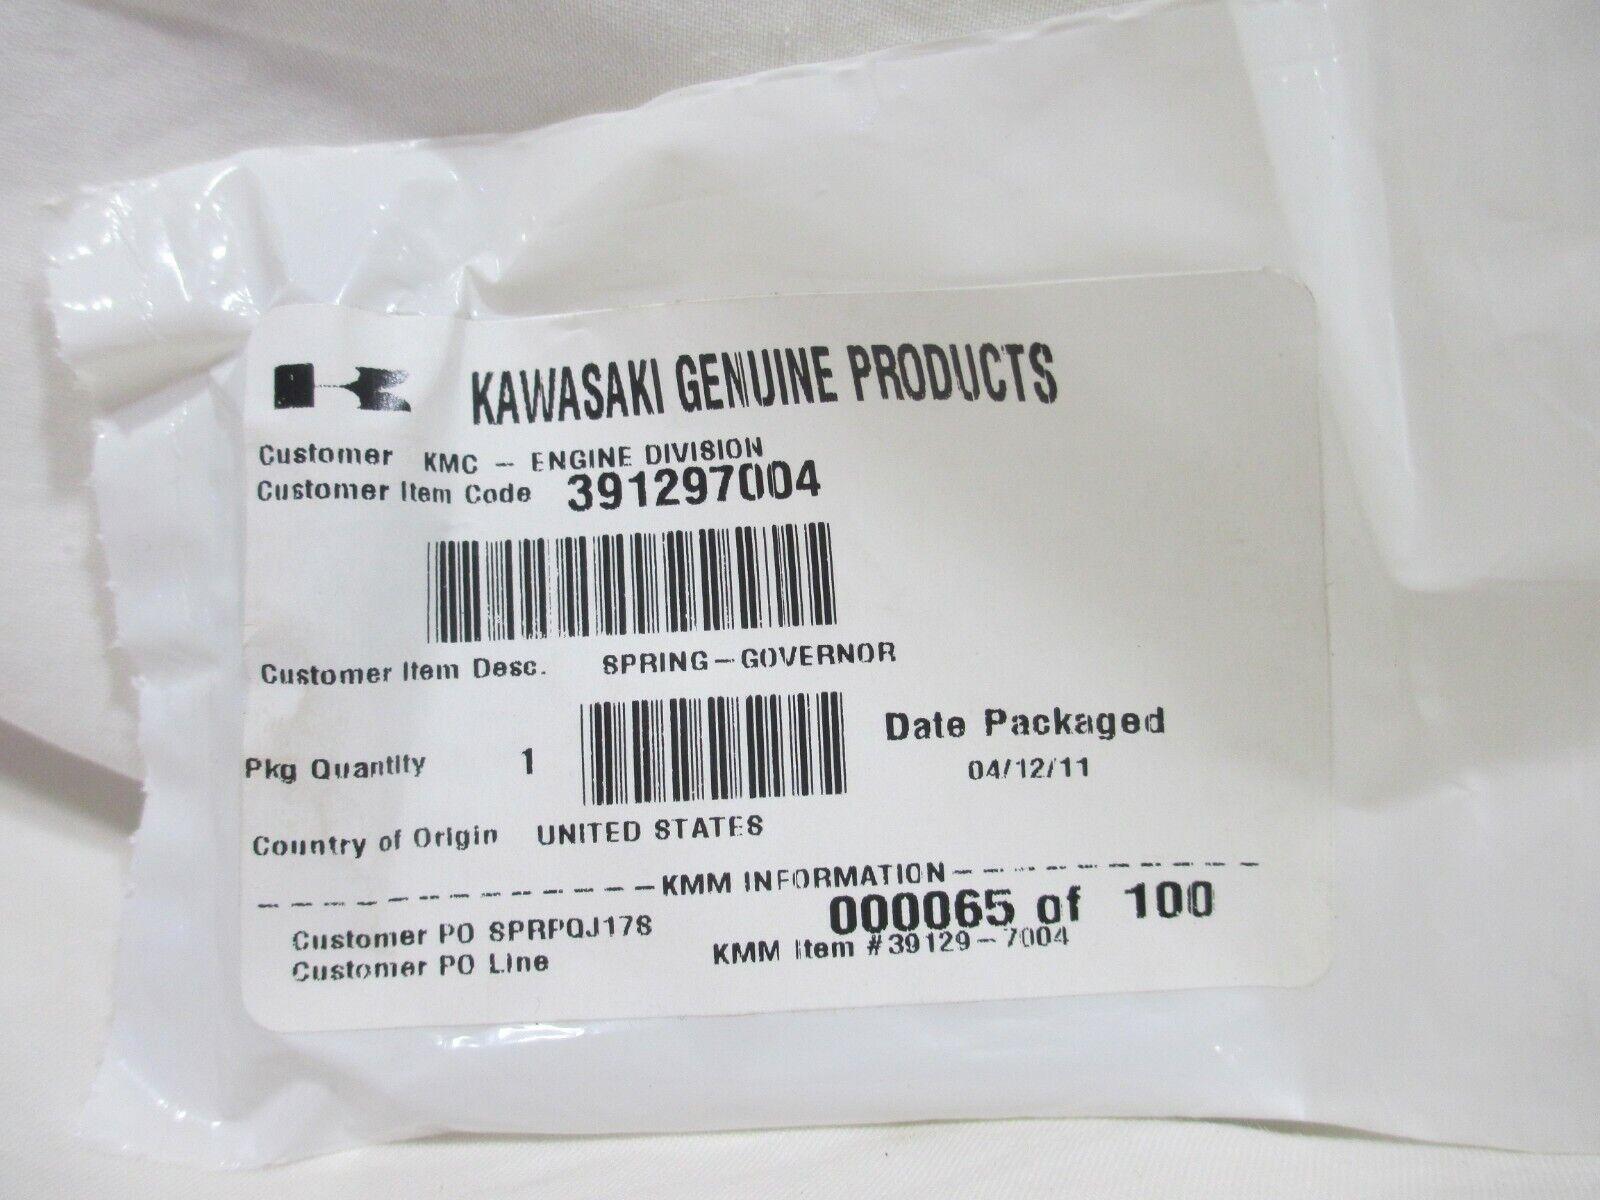 Genuine OEM Kawasaki SPRING-GOVERNOR 39129-2043